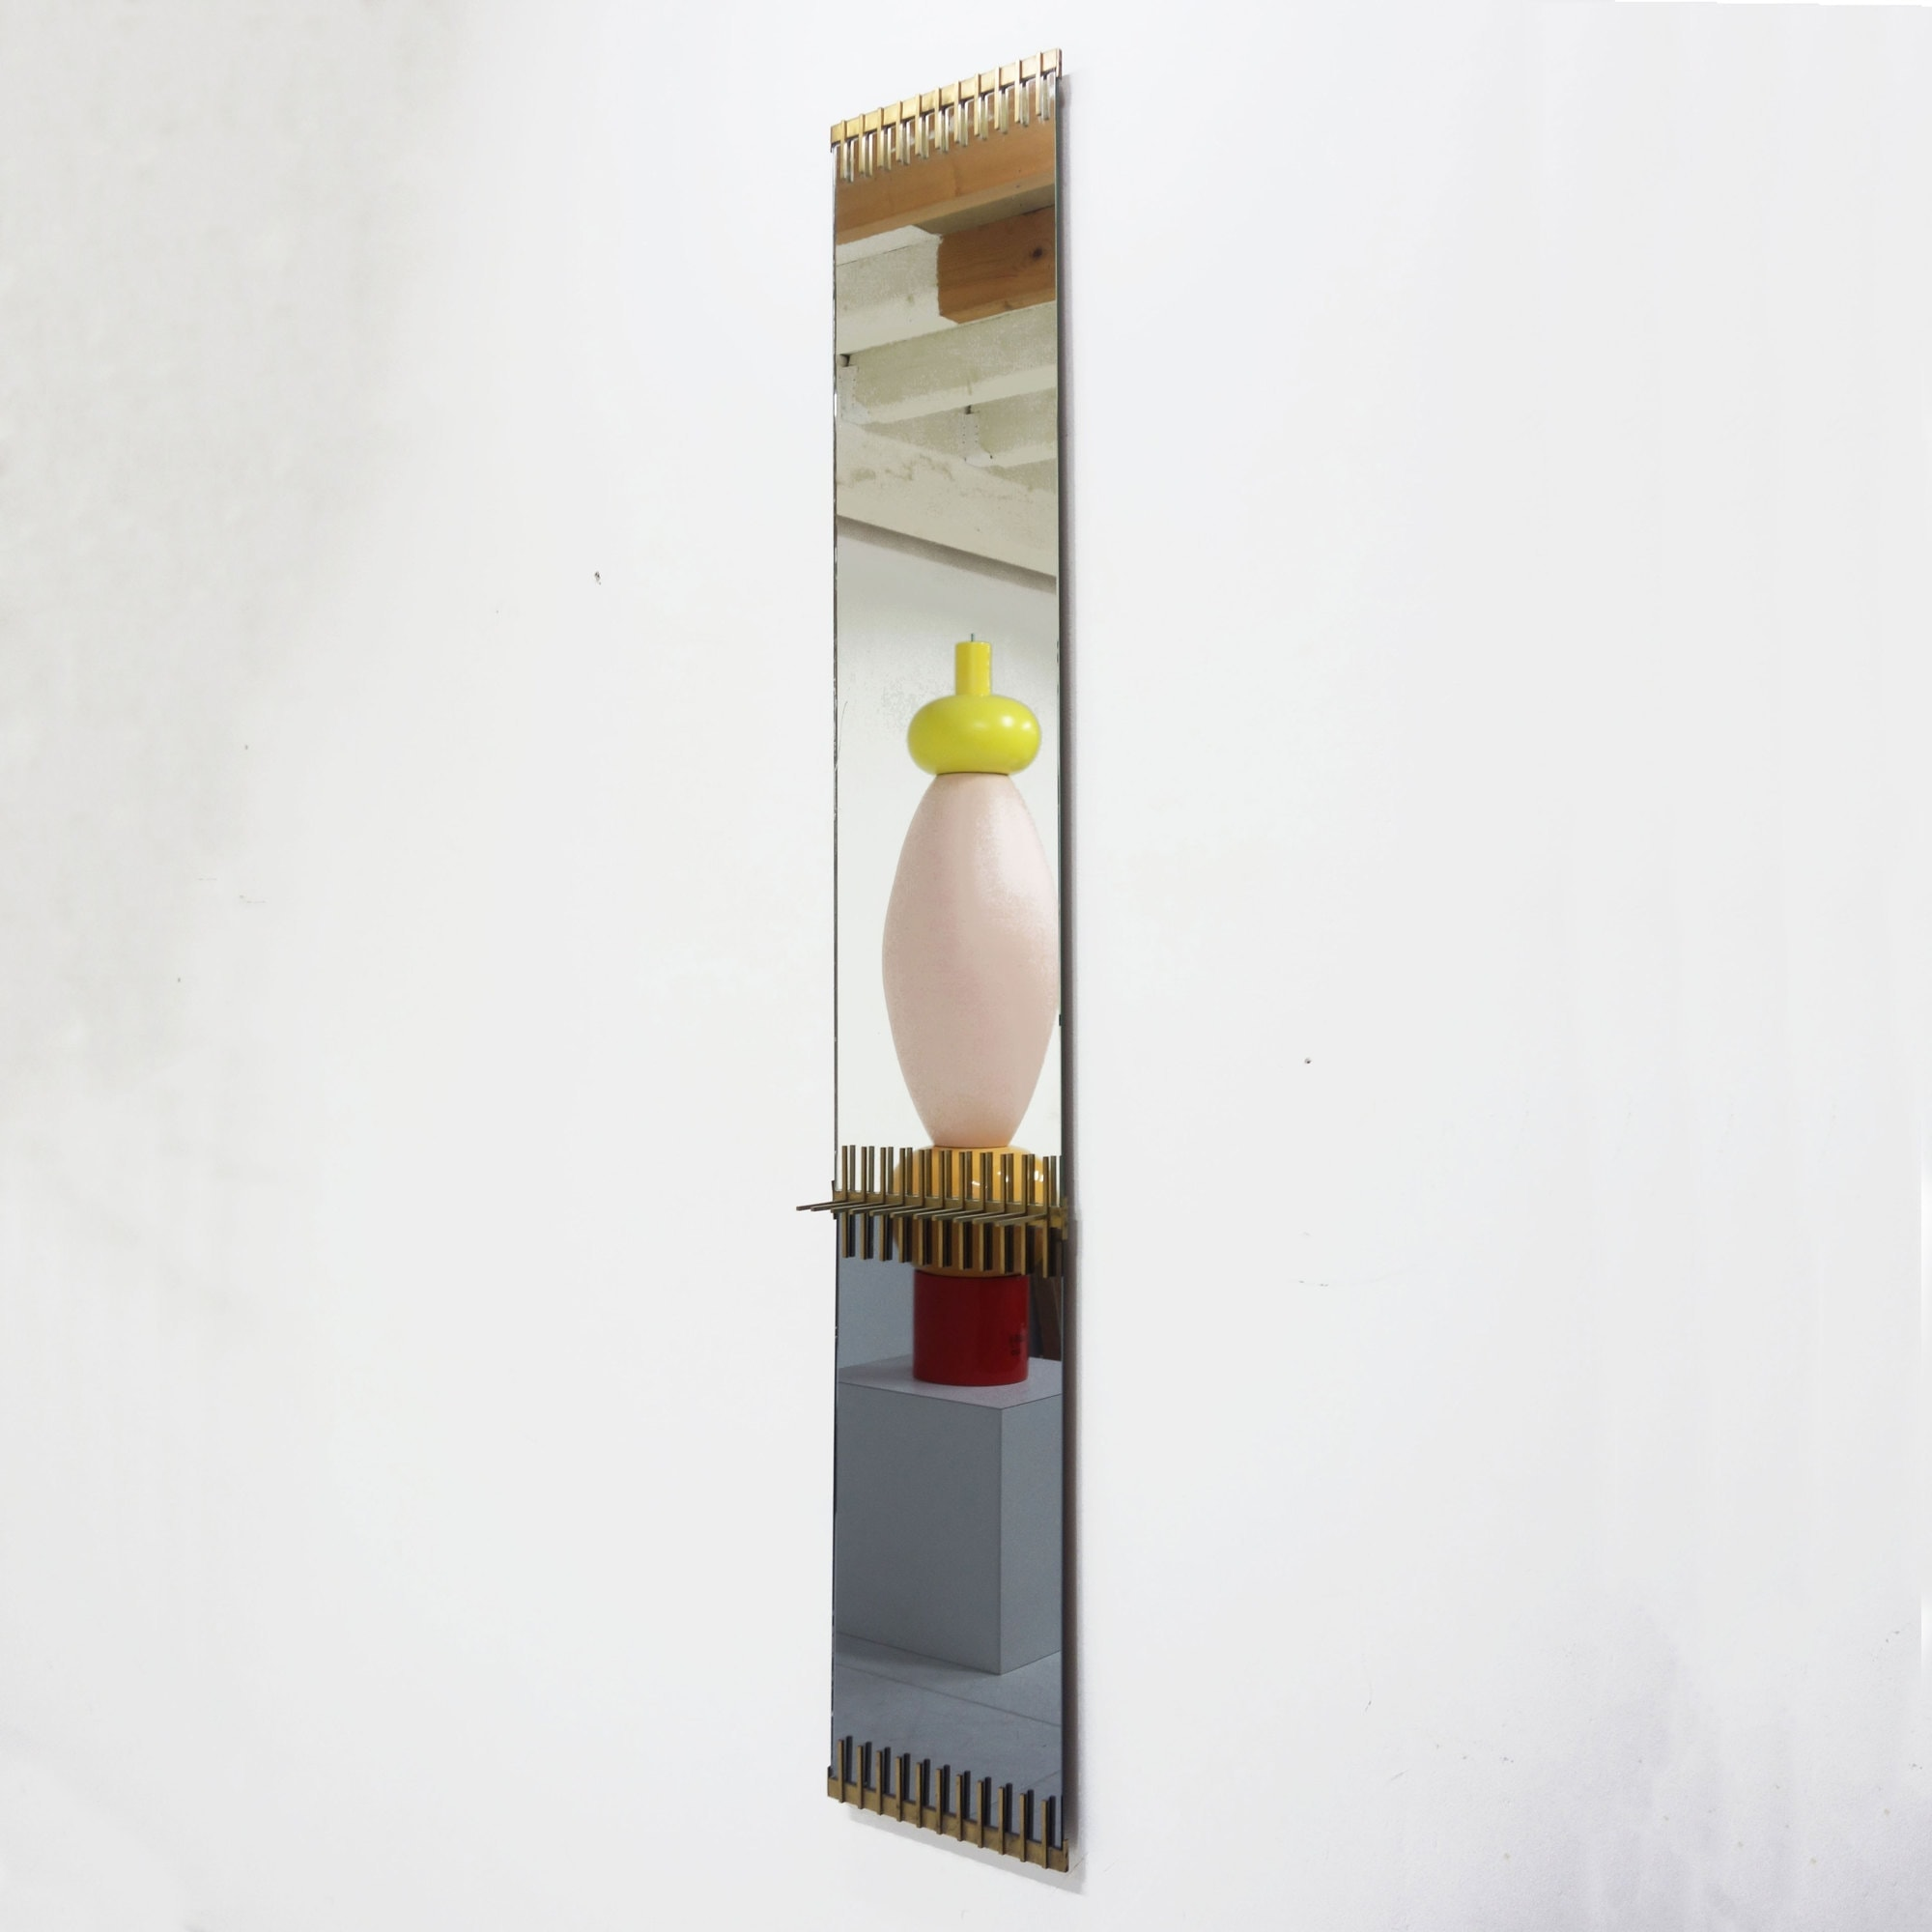 Ettore Sottsass, Rare mirror, vue 01